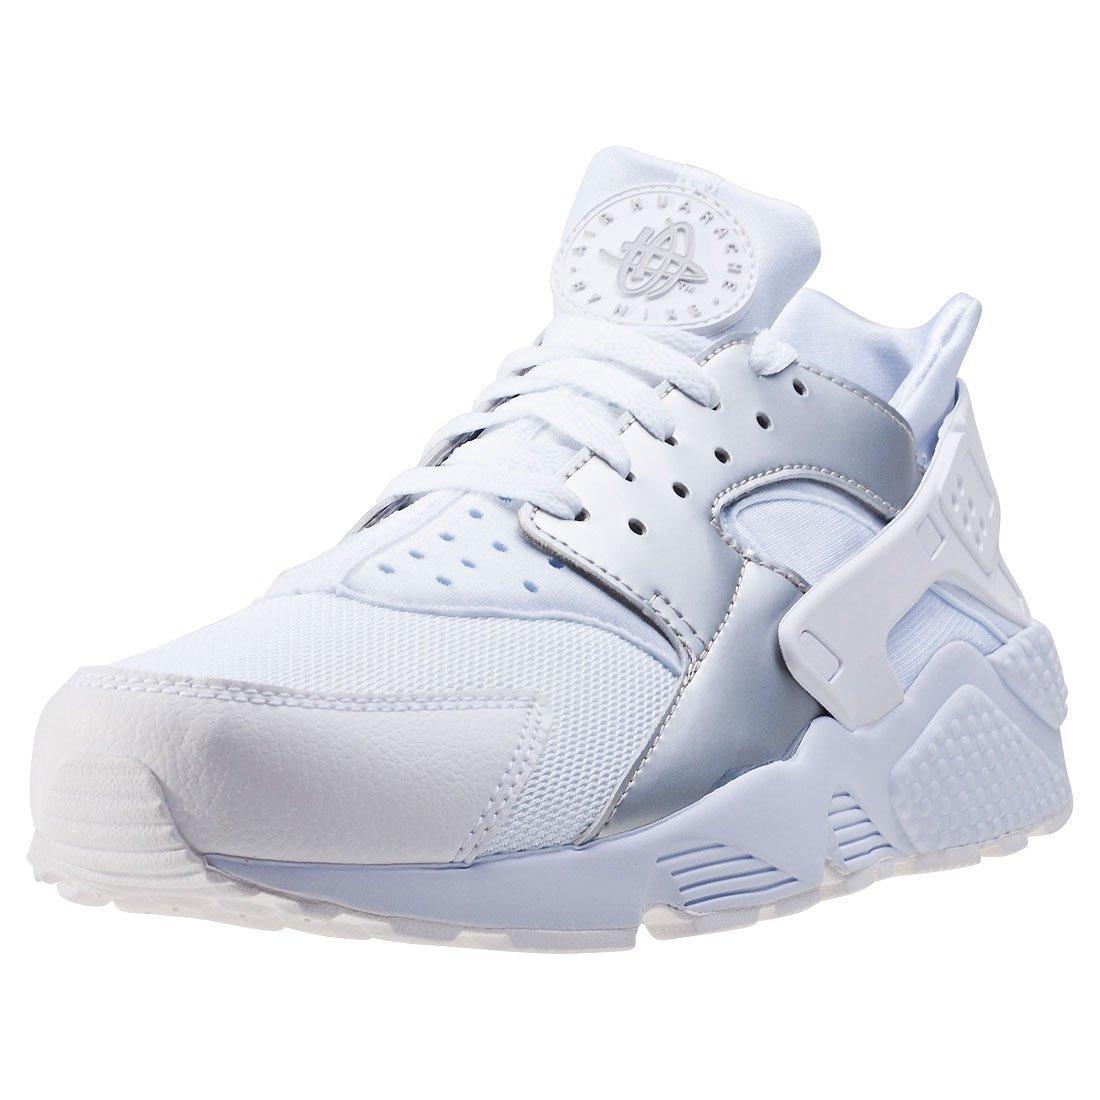 tavola Gestione Simposio  Nike Air Huarache Mens Style: 318429-108 Size: 11 White/Metallic Silver on  Galleon Philippines